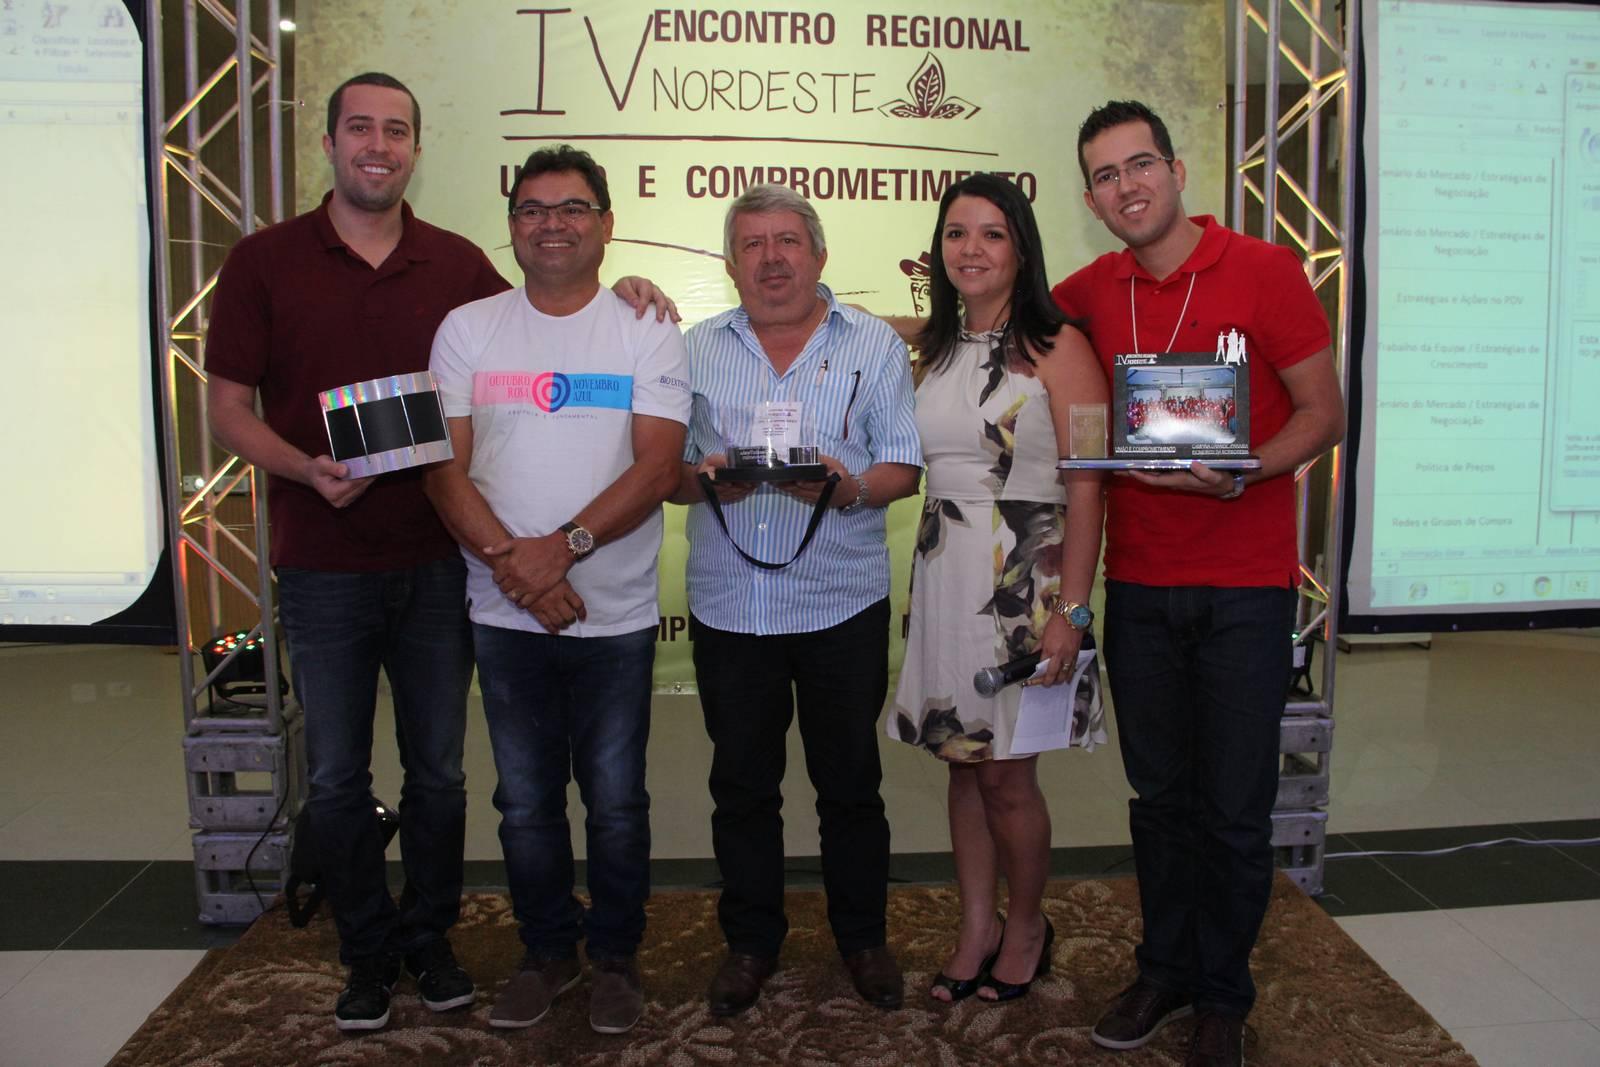 IV Encontro Regional do Nordeste - Bio Extratus (298)